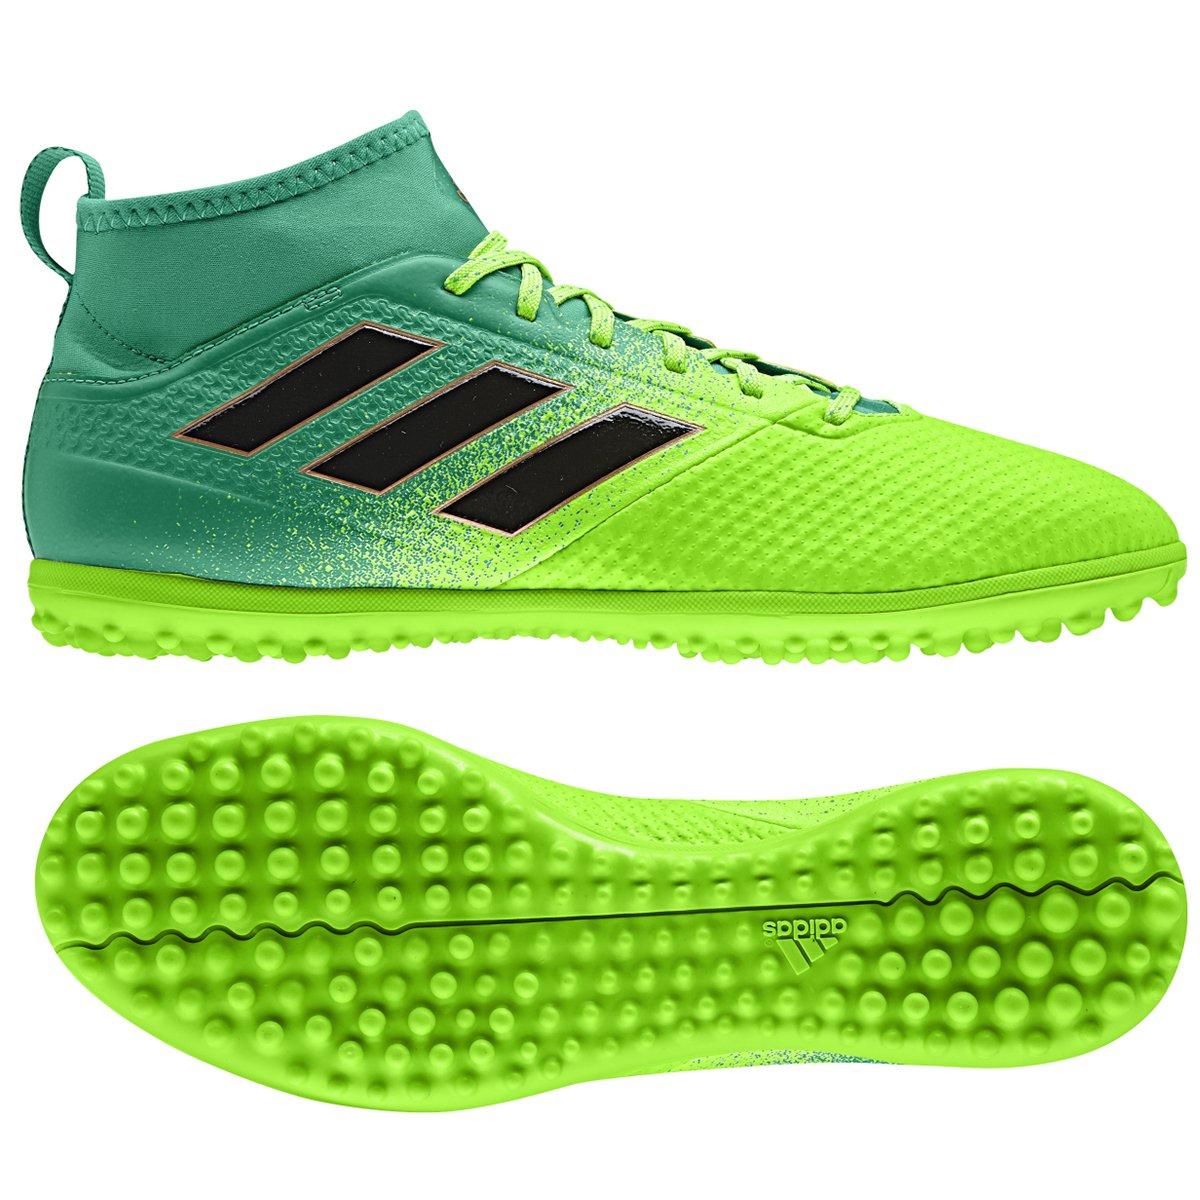 best service b0612 e5631 Chuteira Society Adidas Ace 17.3 TF